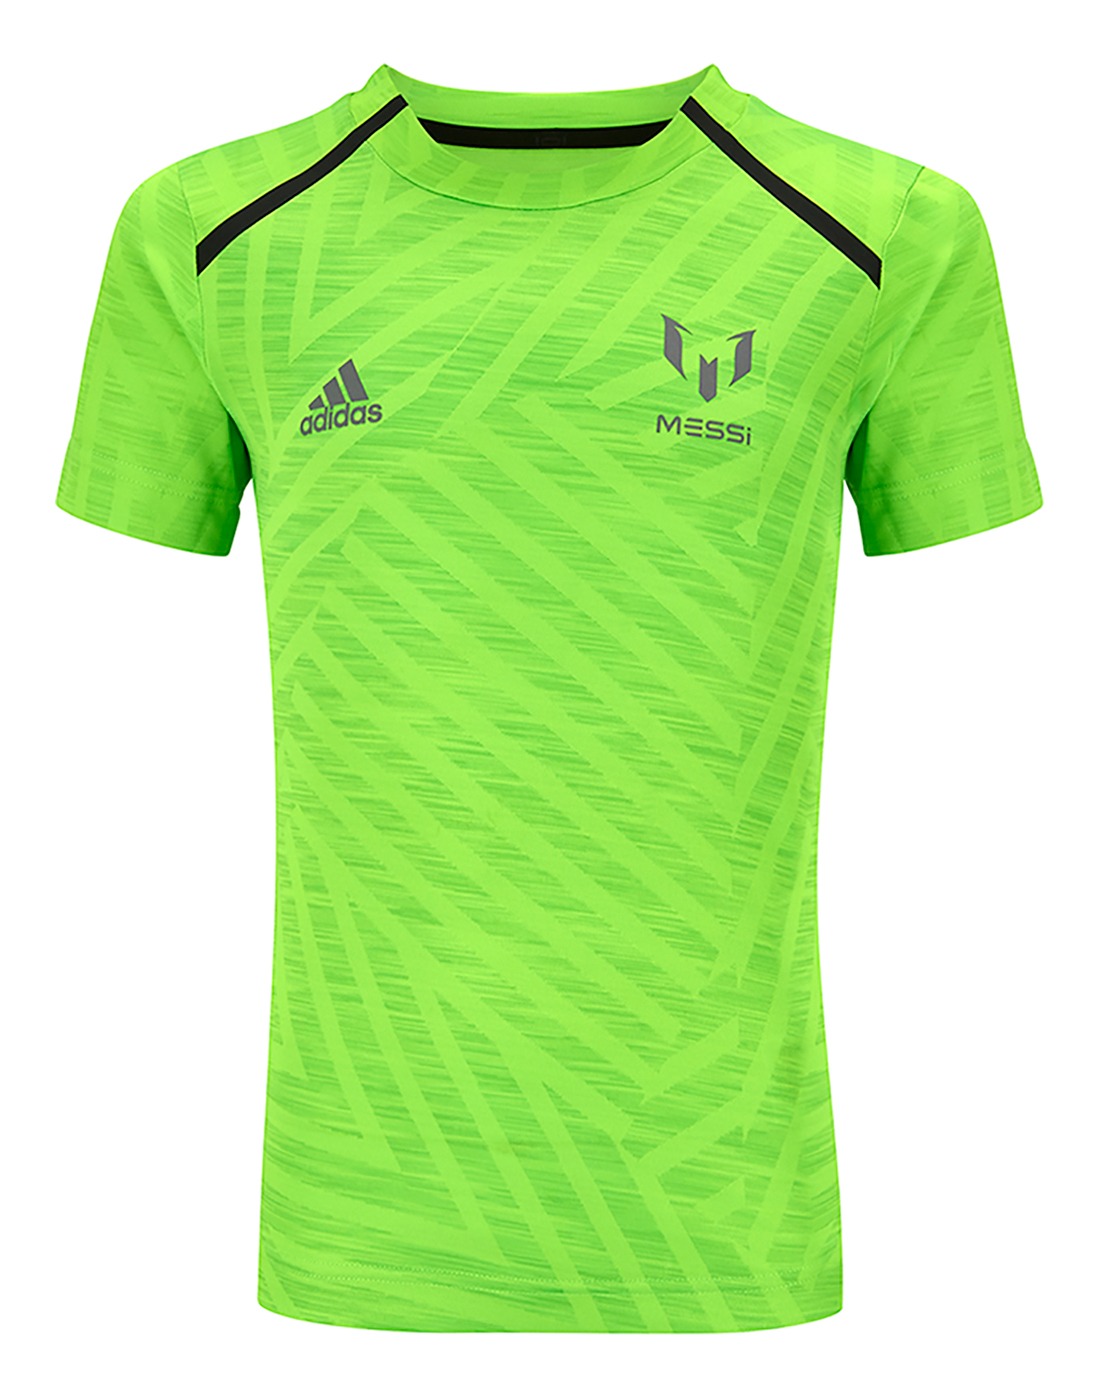 7833c851f21 Boy s Green adidas Messi Icon T-Shirt